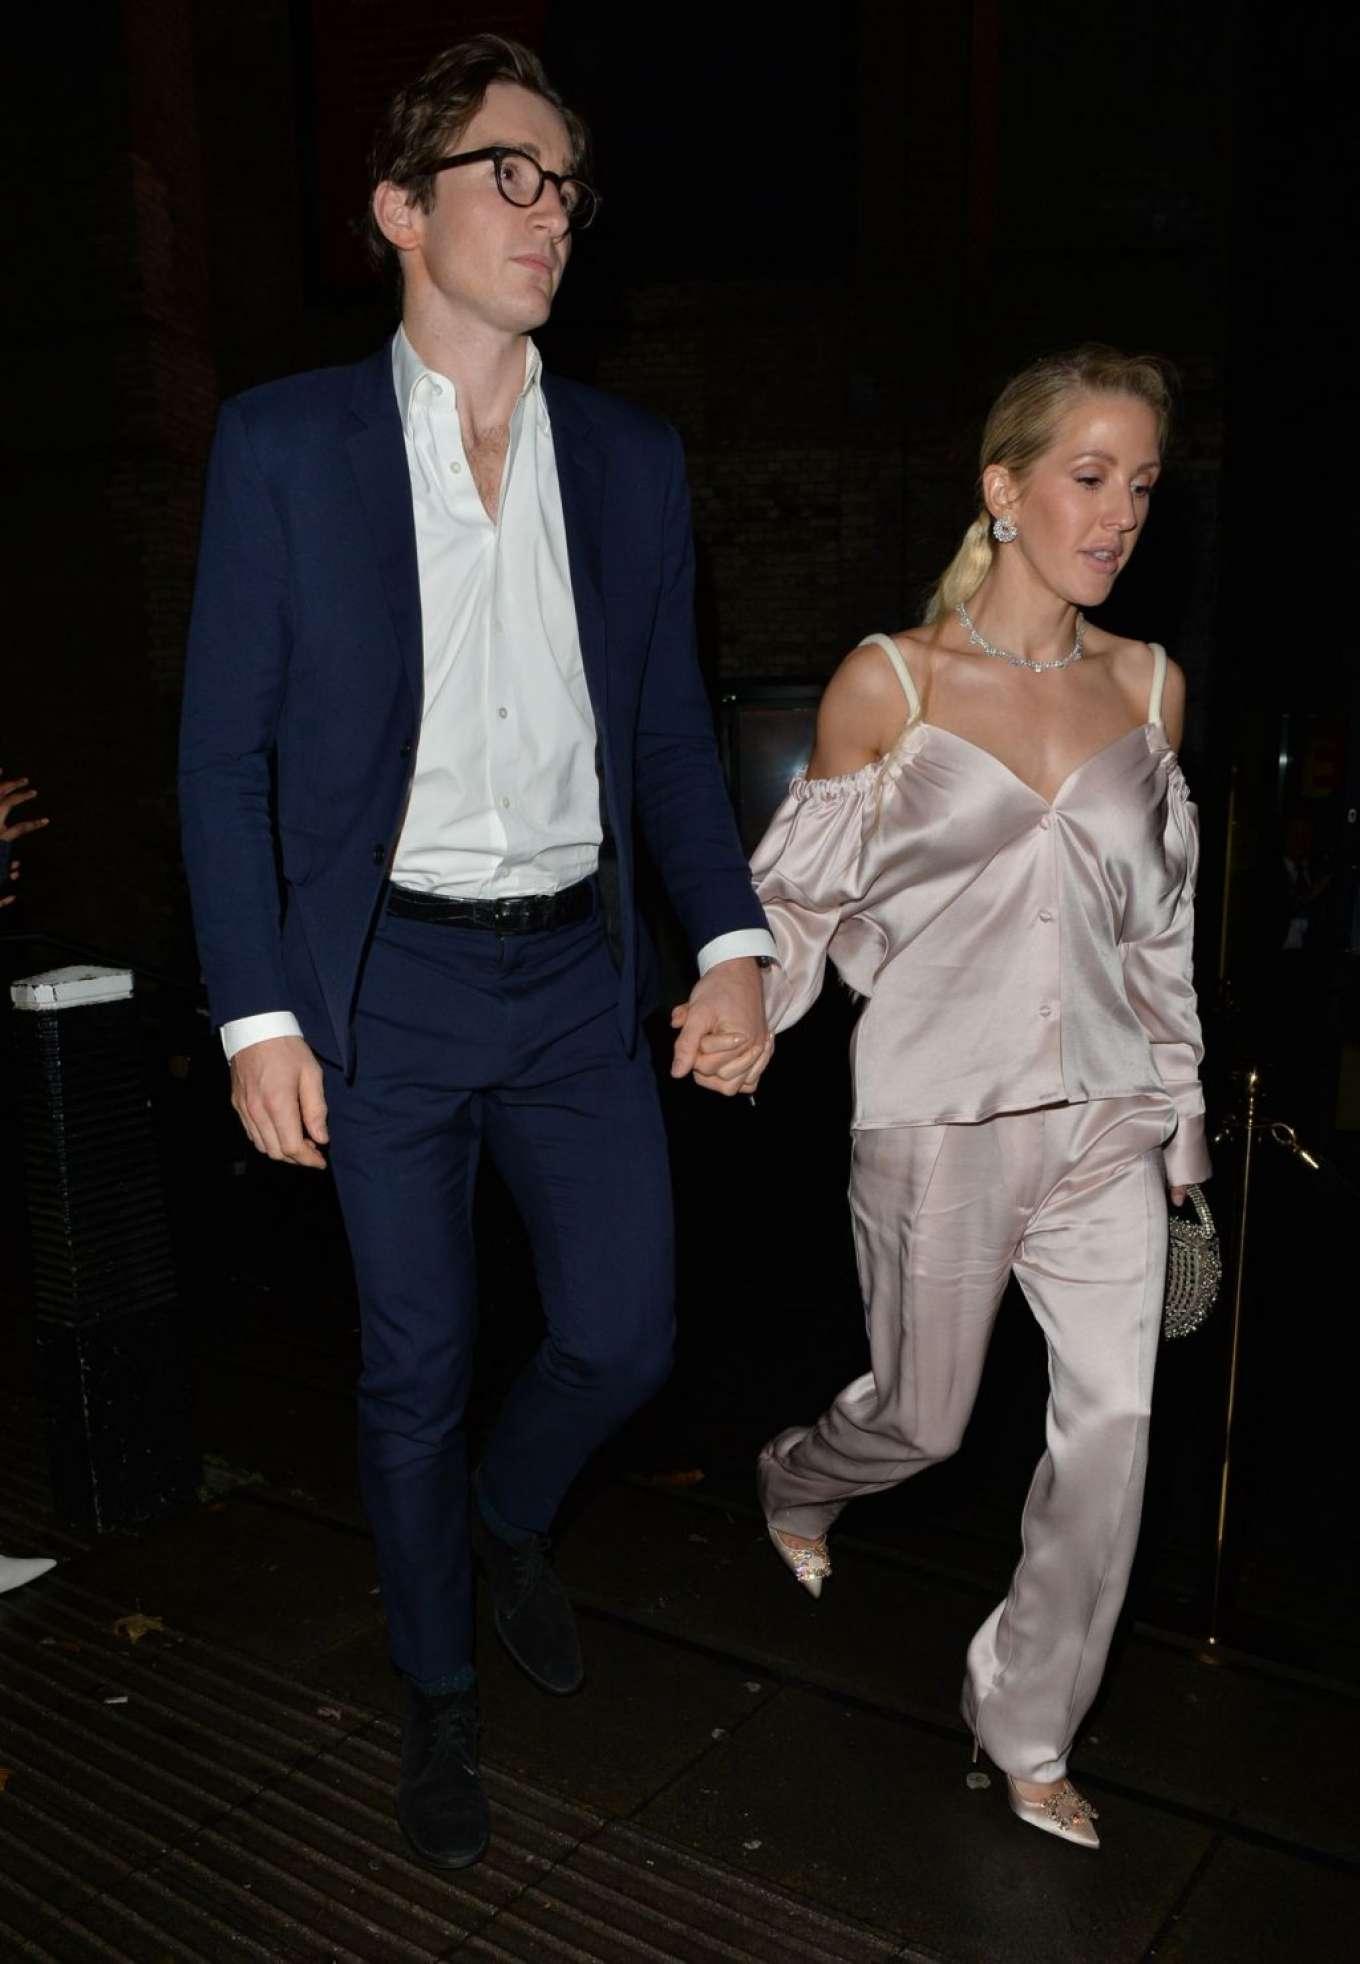 Ellie Goulding 2019 : Ellie Goulding and her husband Jaspar Copling were seen leaving the Roundhouse in Camden – London-19